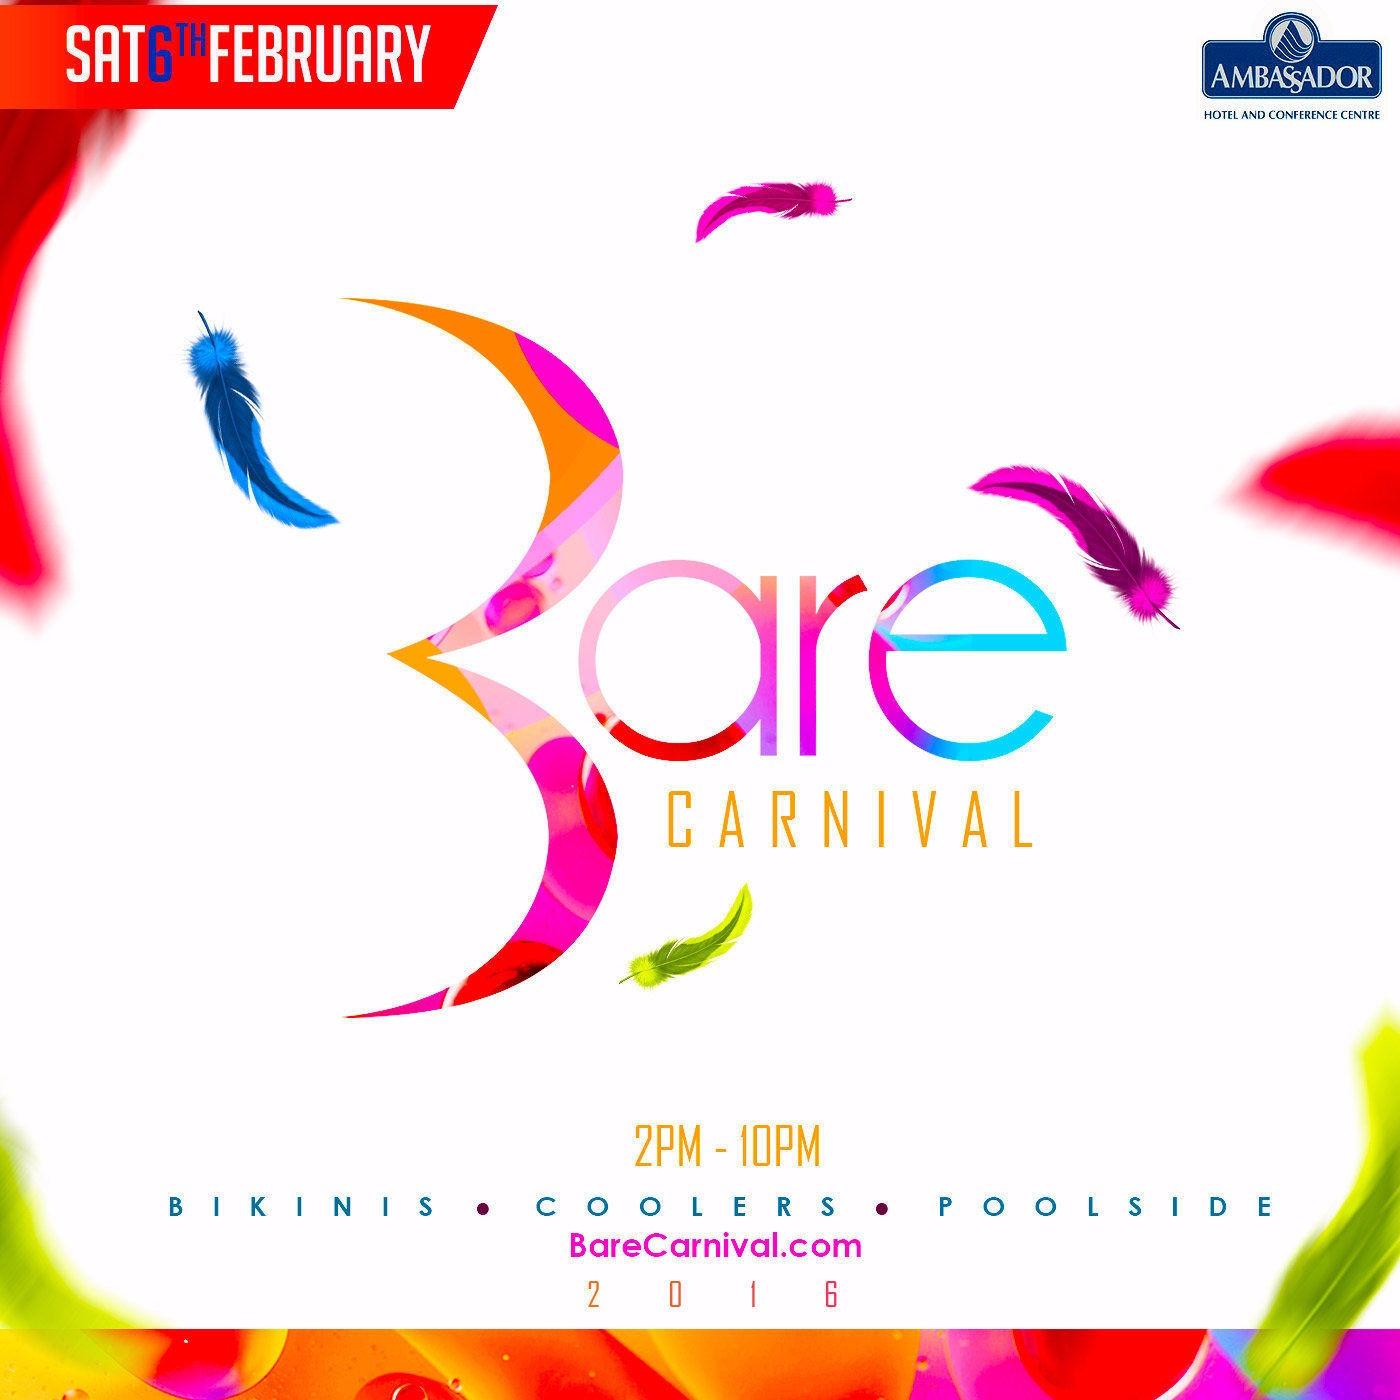 Bare Carnival